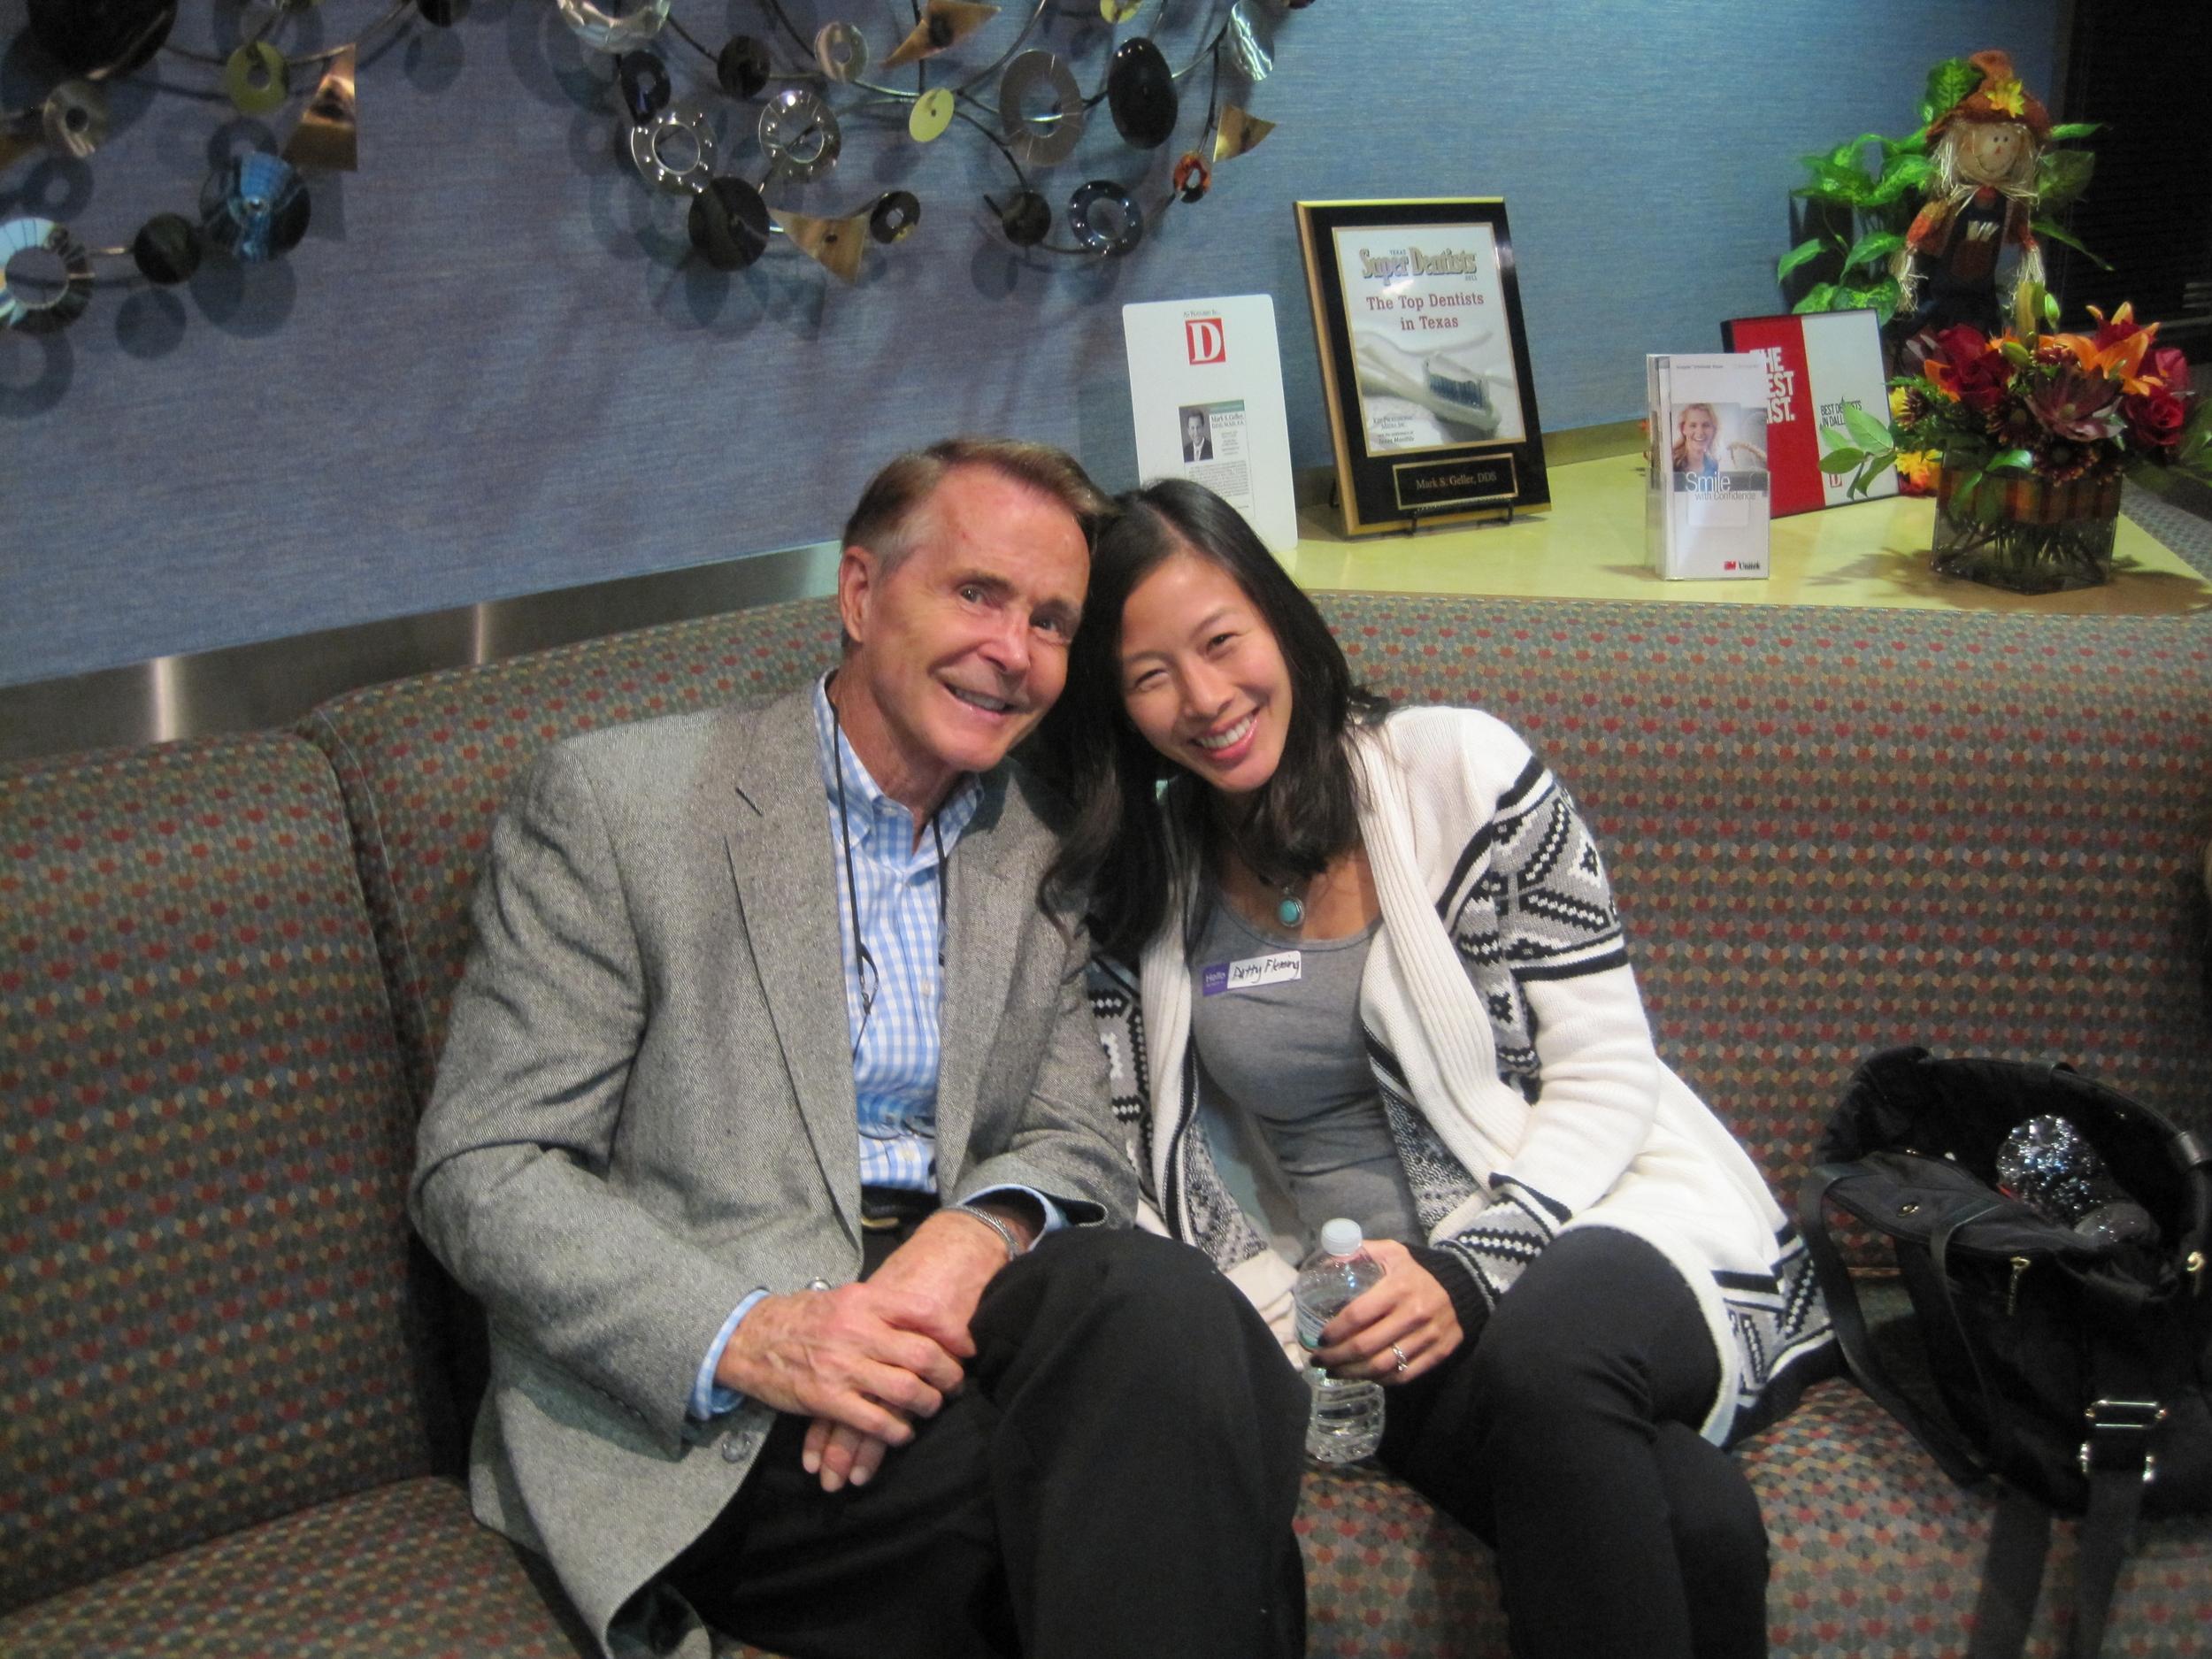 Drs. Jim Boley and Patty Flemming